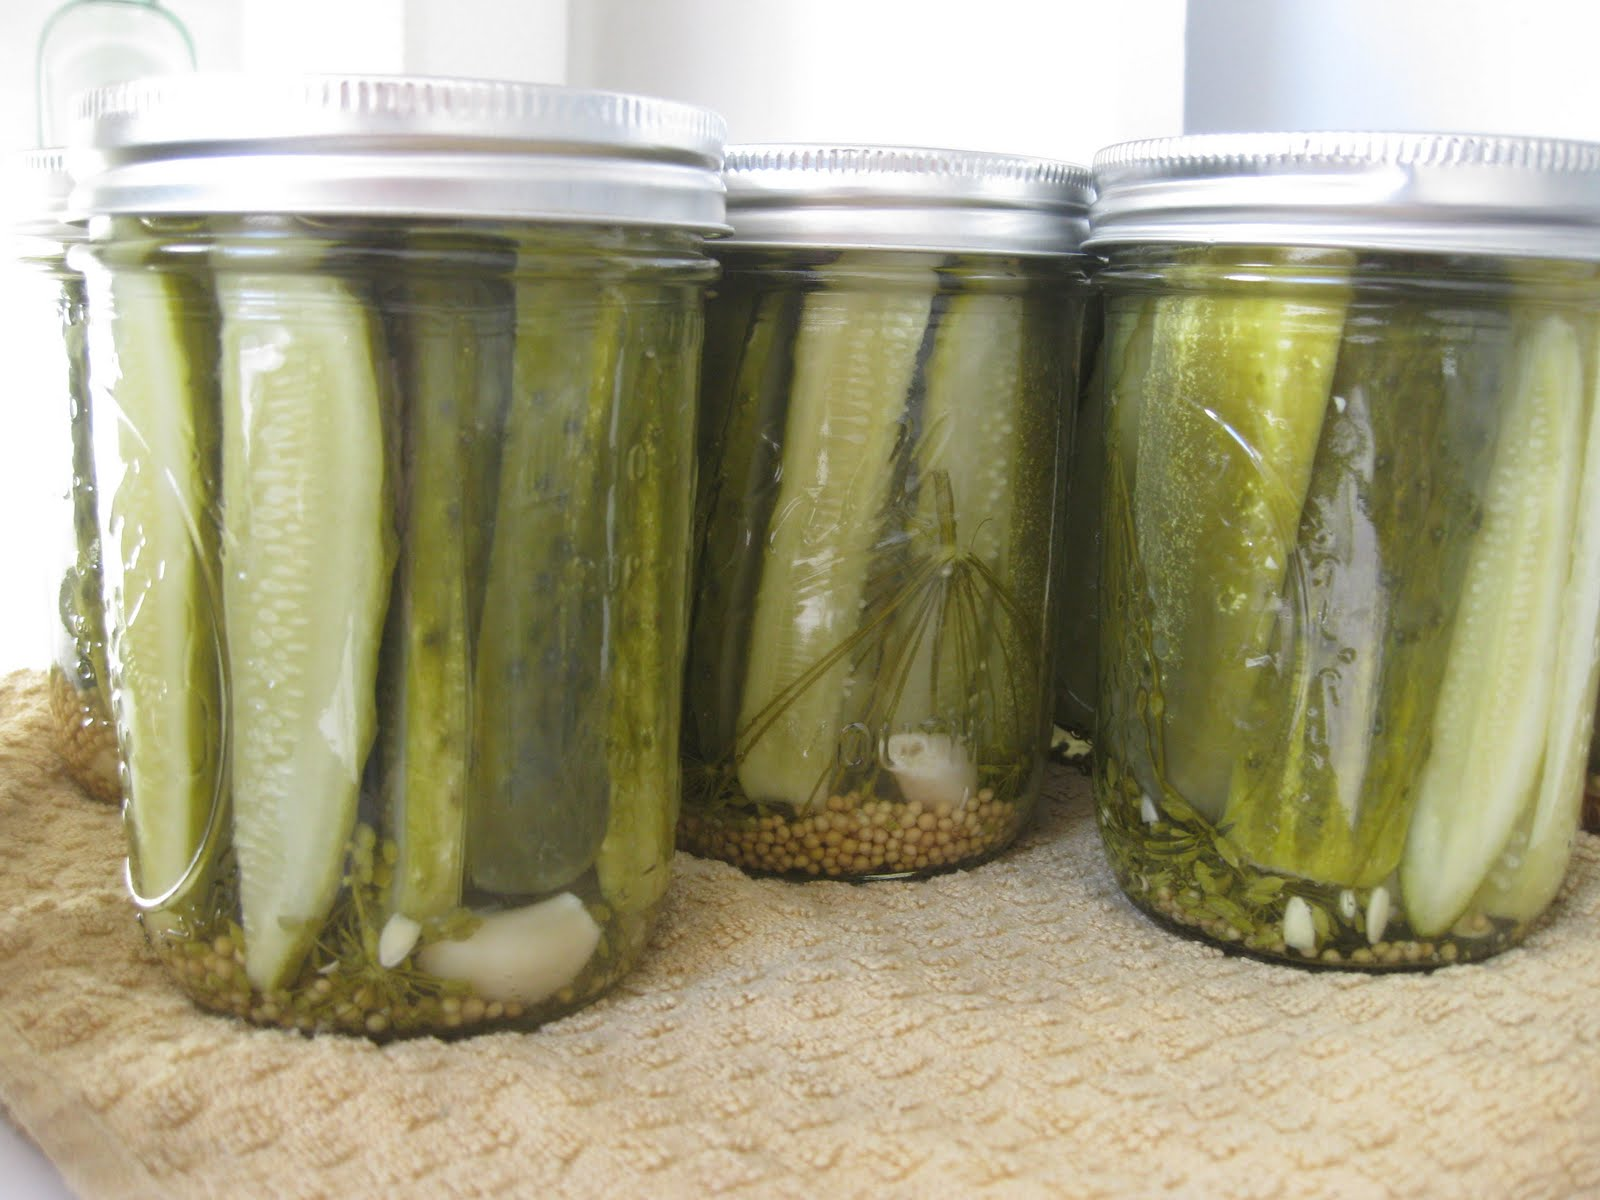 Pickles, crisp and sour